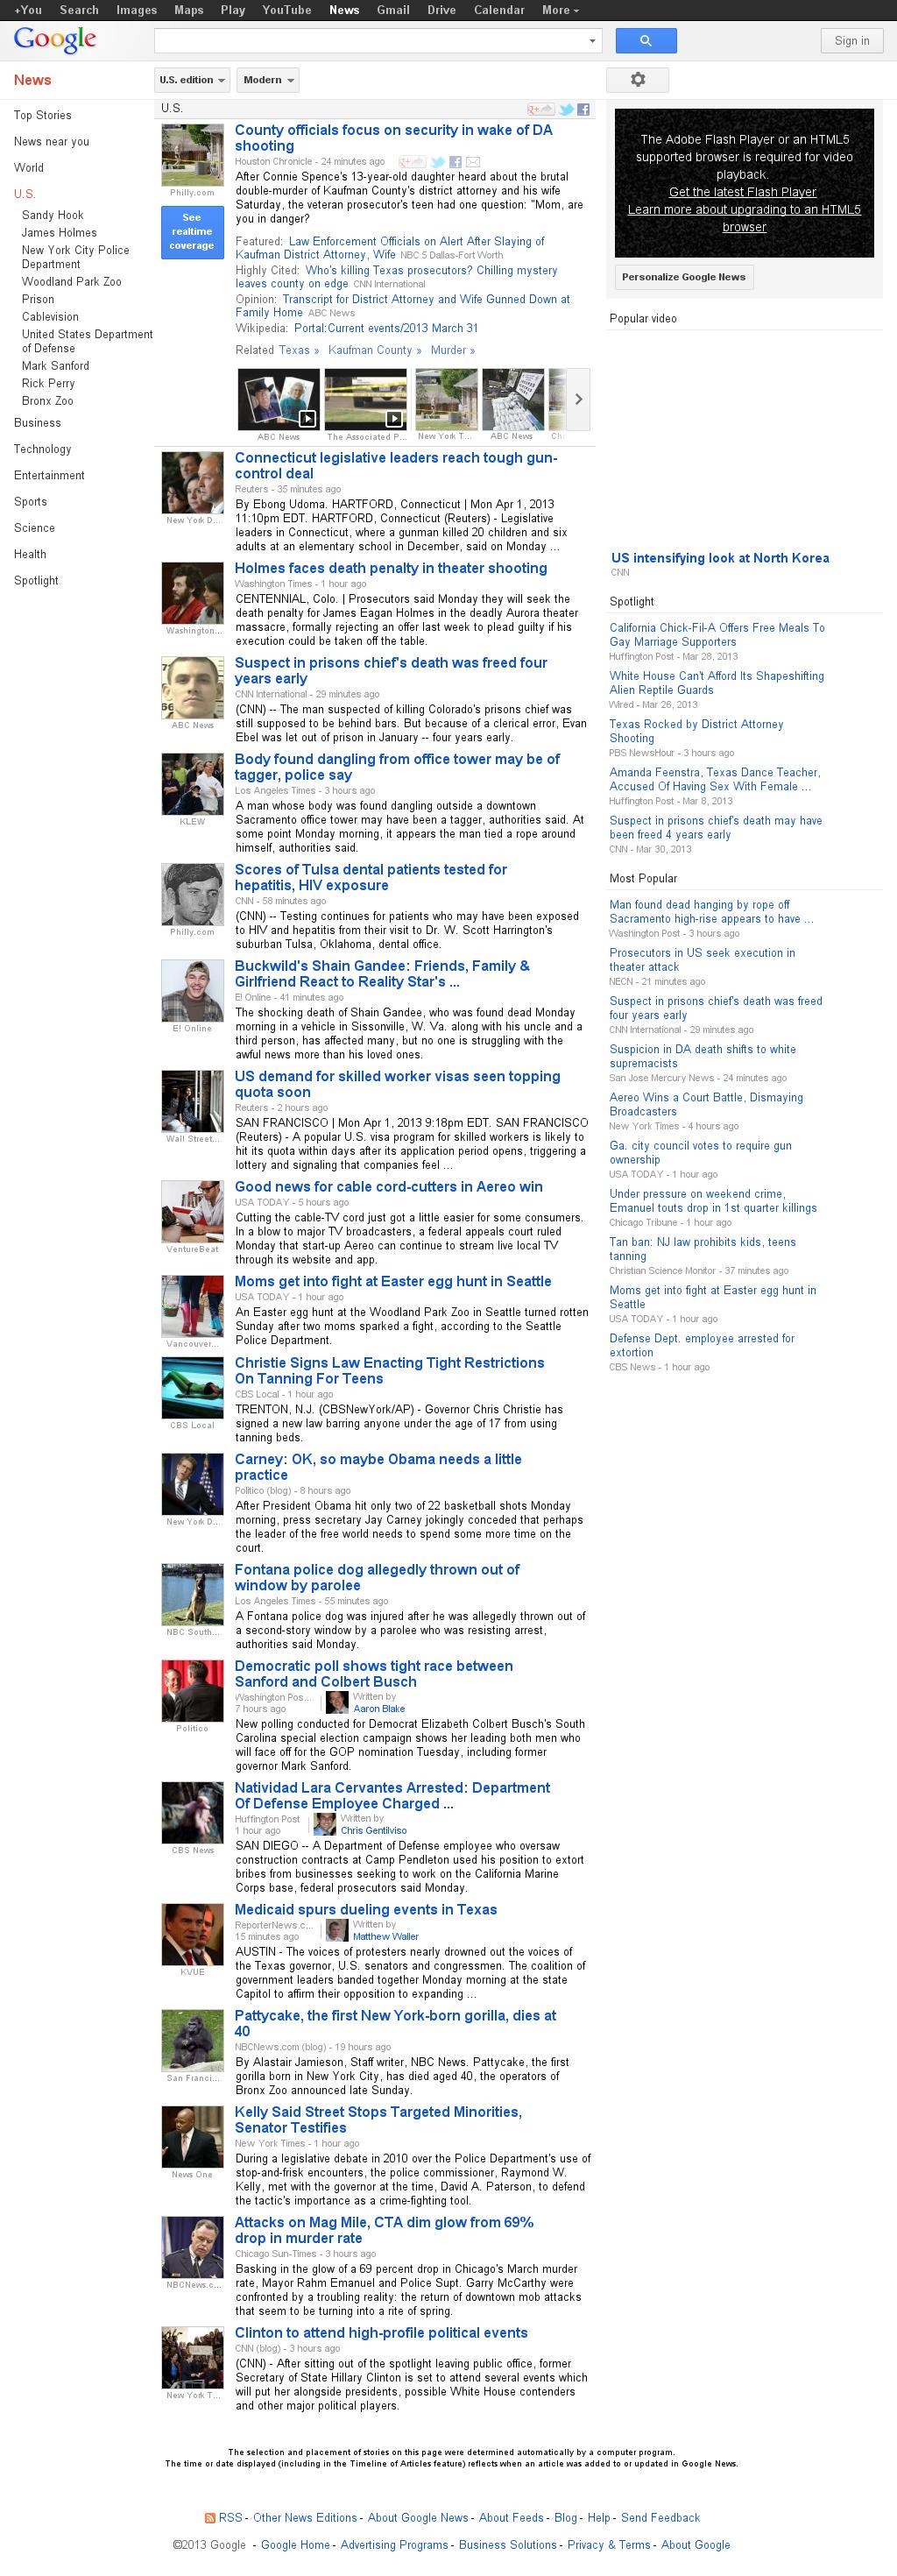 Google News: U.S. at Tuesday April 2, 2013, 4:09 a.m. UTC